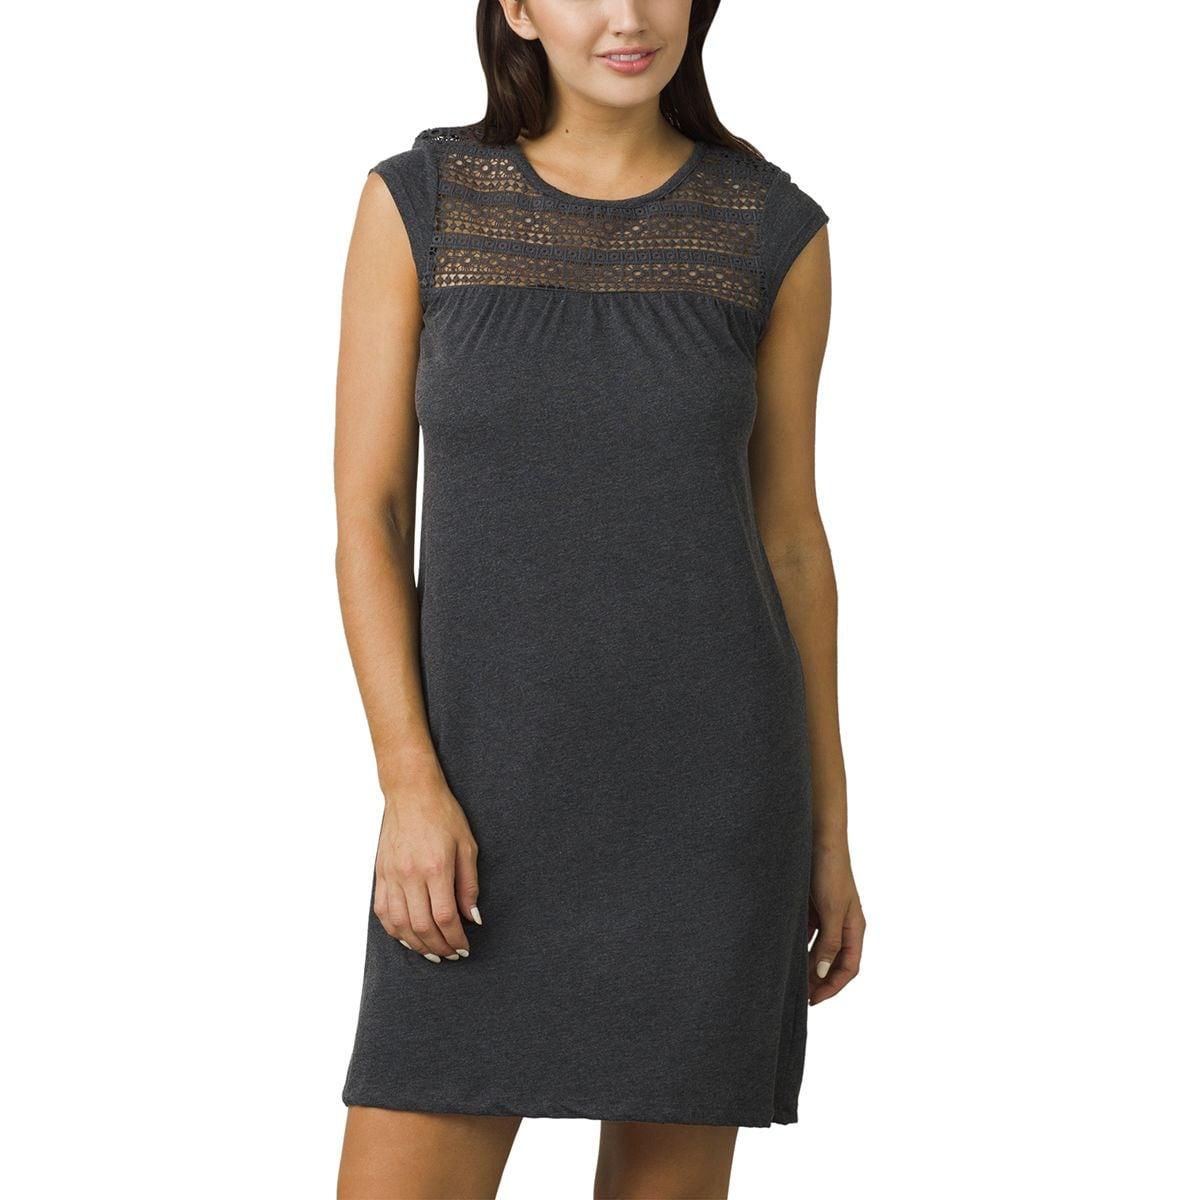 Prana Day Dream Dress - Women's Black, XL PRA016F-BK-XL